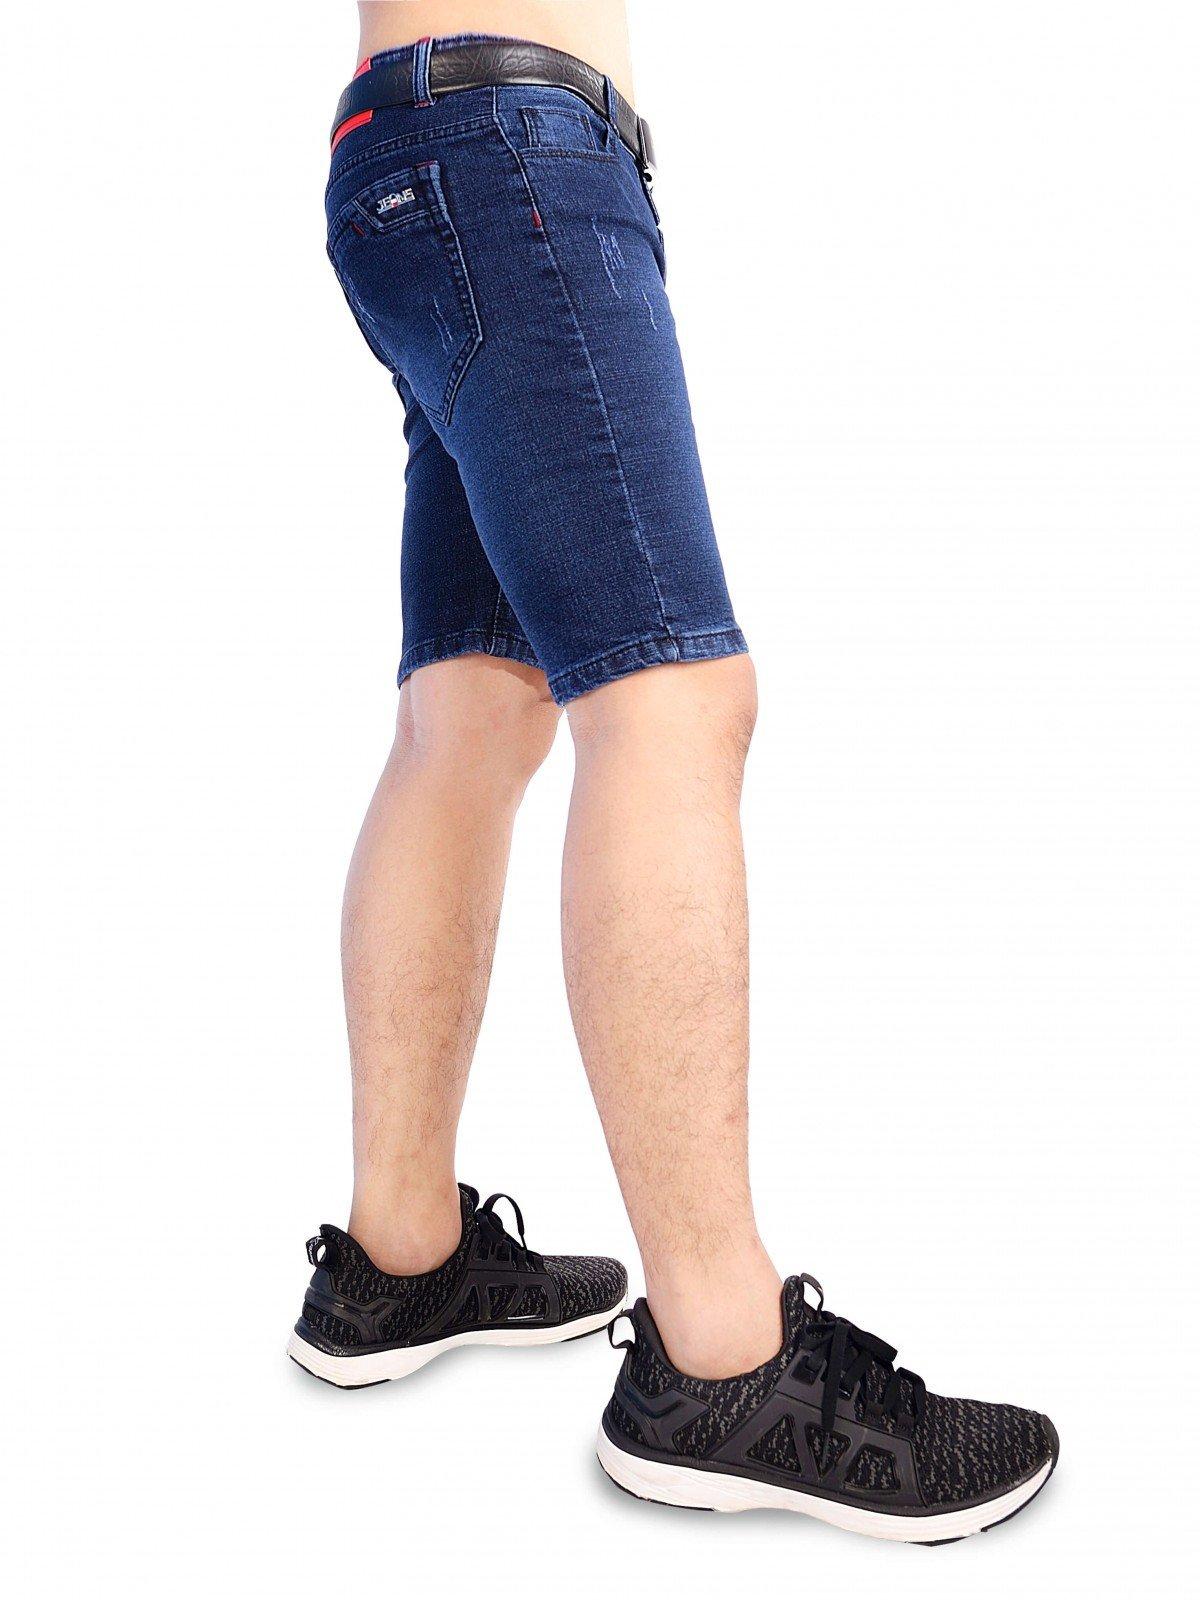 Quan short nam